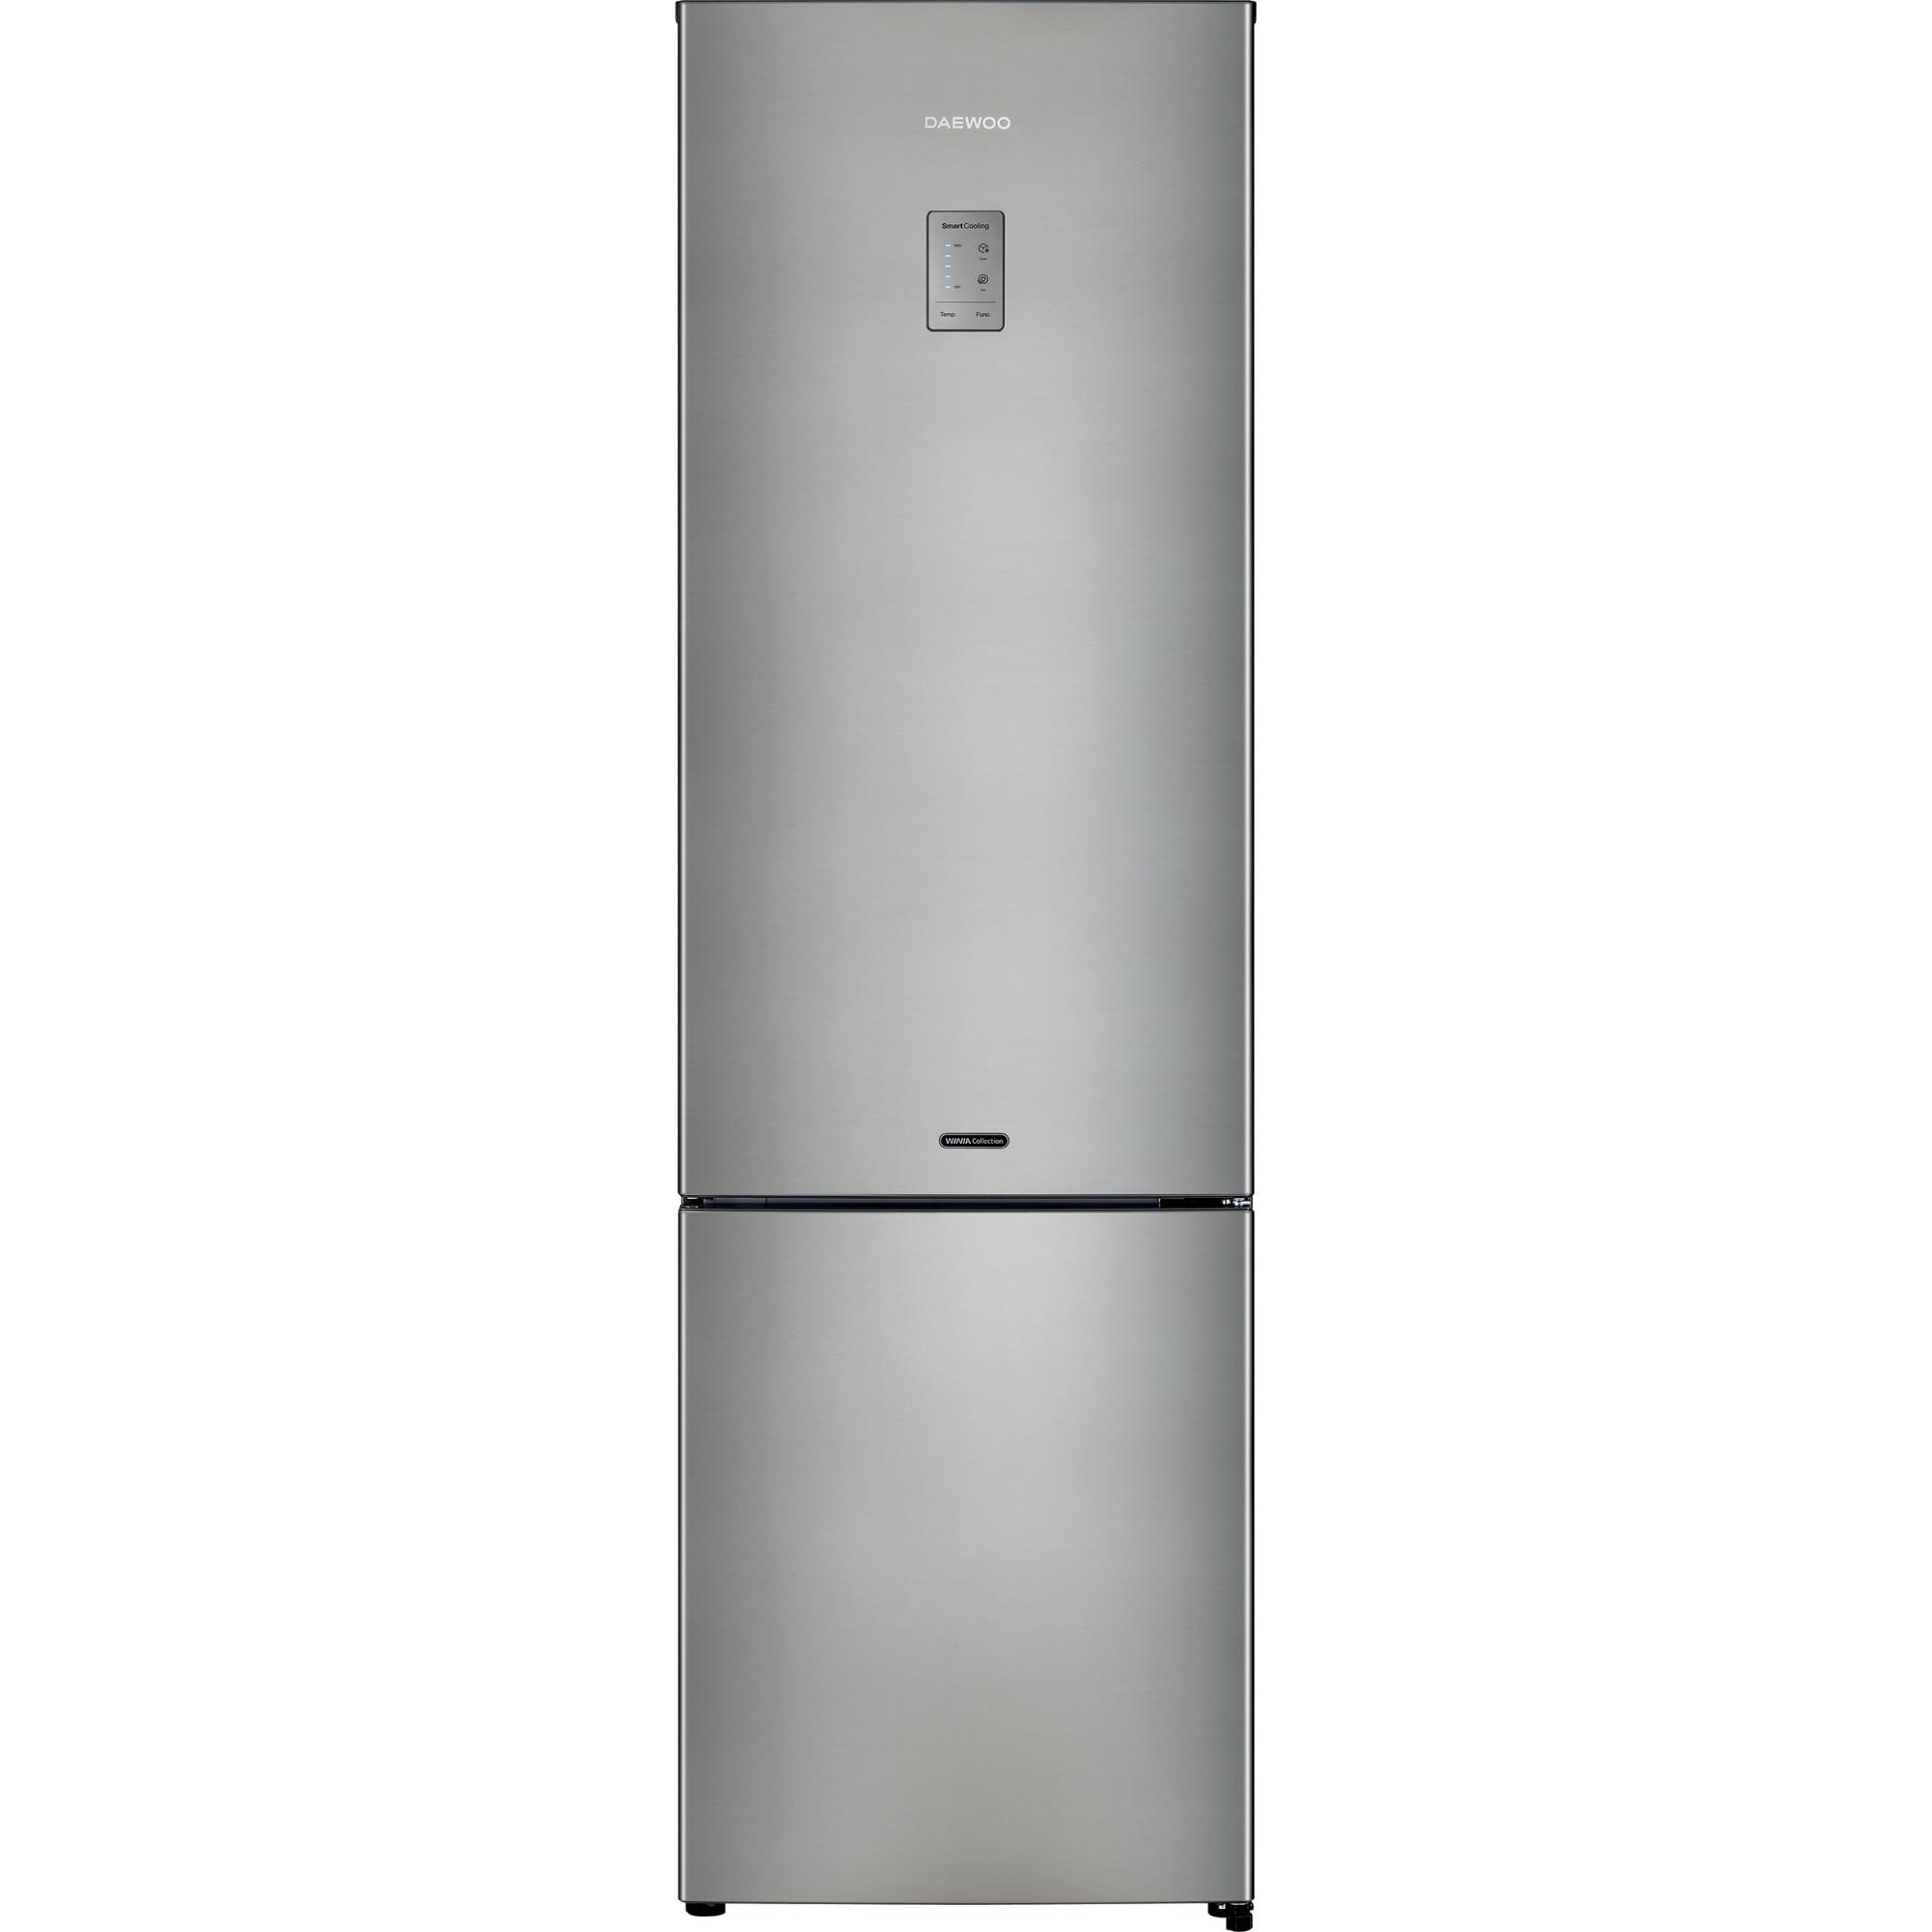 Fotografie Combina frigorifica Daewoo RN-N536RNS, 362 l, Clasa E, Full No Frost, Iluminare LED, H 200 cm, Inox